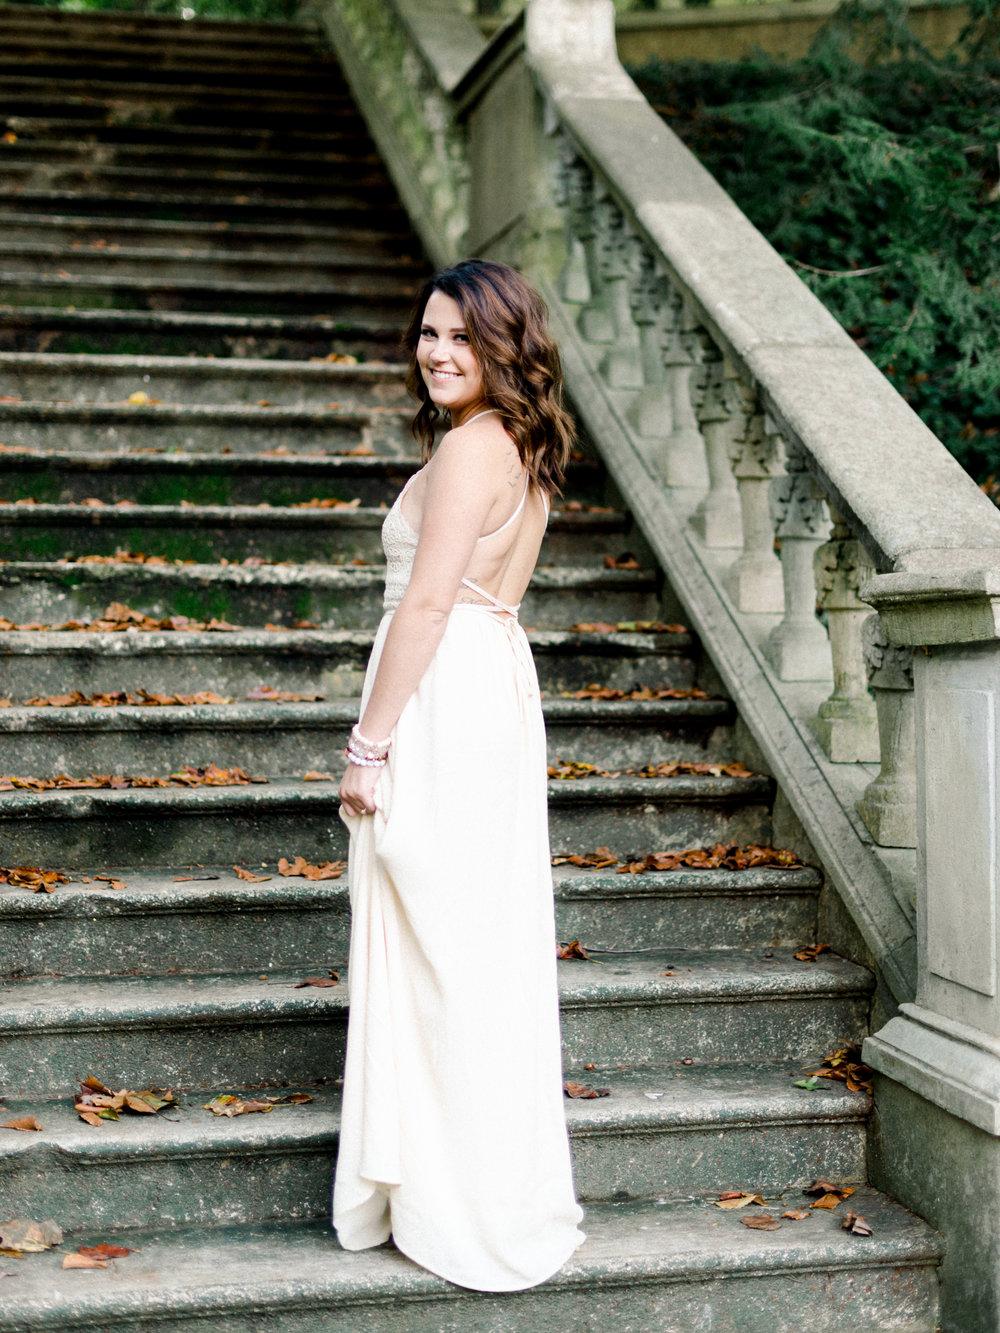 Jenna_Sam_Engagment_Cator_Woolford_Gardens_Atlanta_Georgia_Fallen_Photography-9.JPG